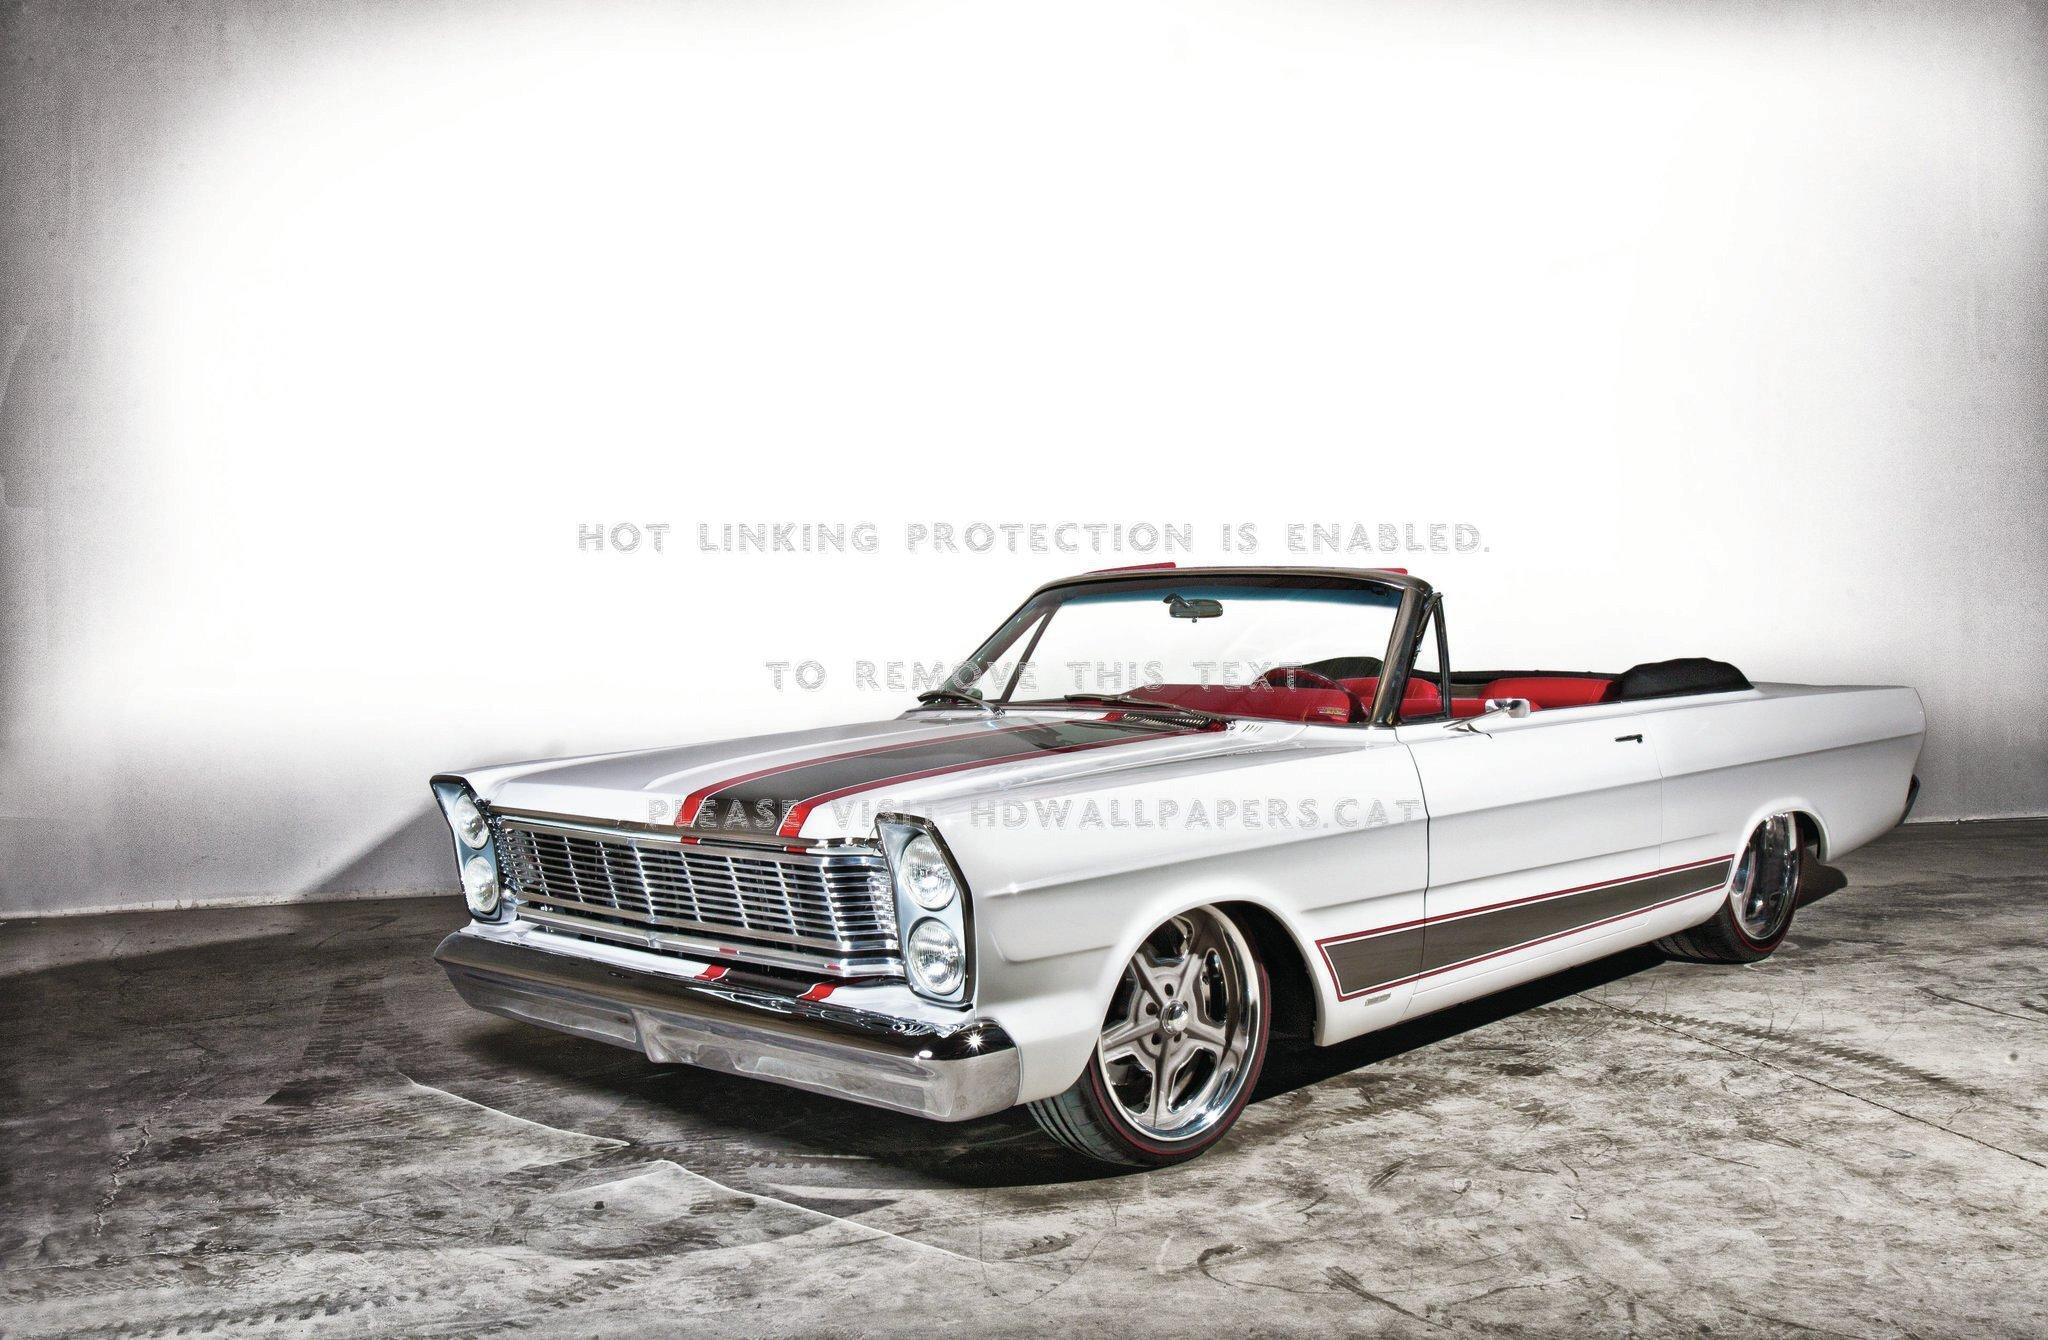 1965 Ford Galaxie 500 Muscle Car White Conv - Ford Galaxie Hot Rod - HD Wallpaper